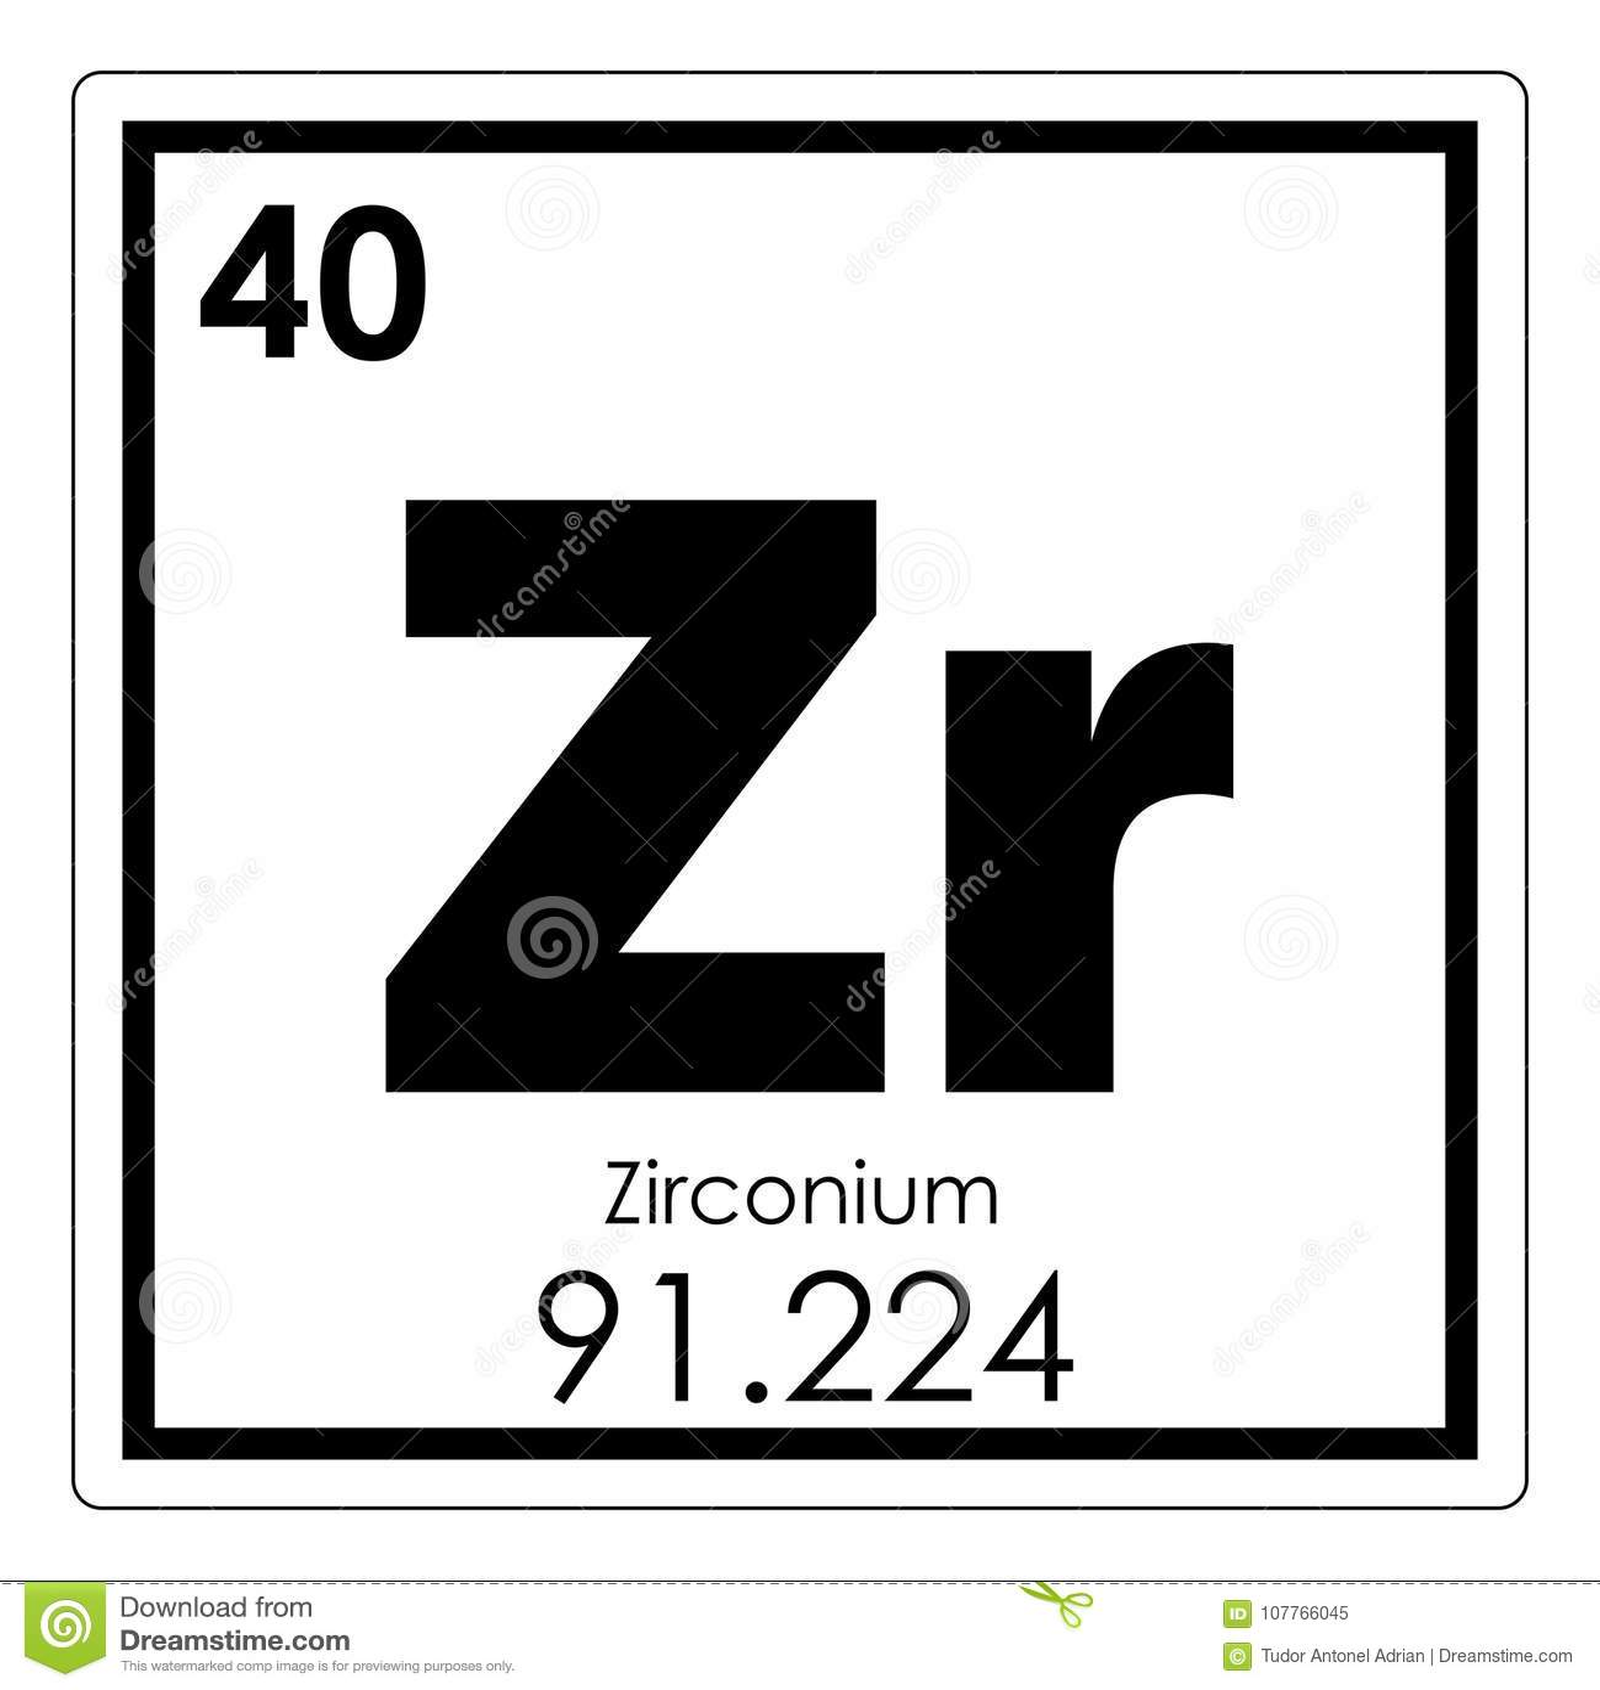 Zirconium Chemical Element Stock Illustration Illustration Of